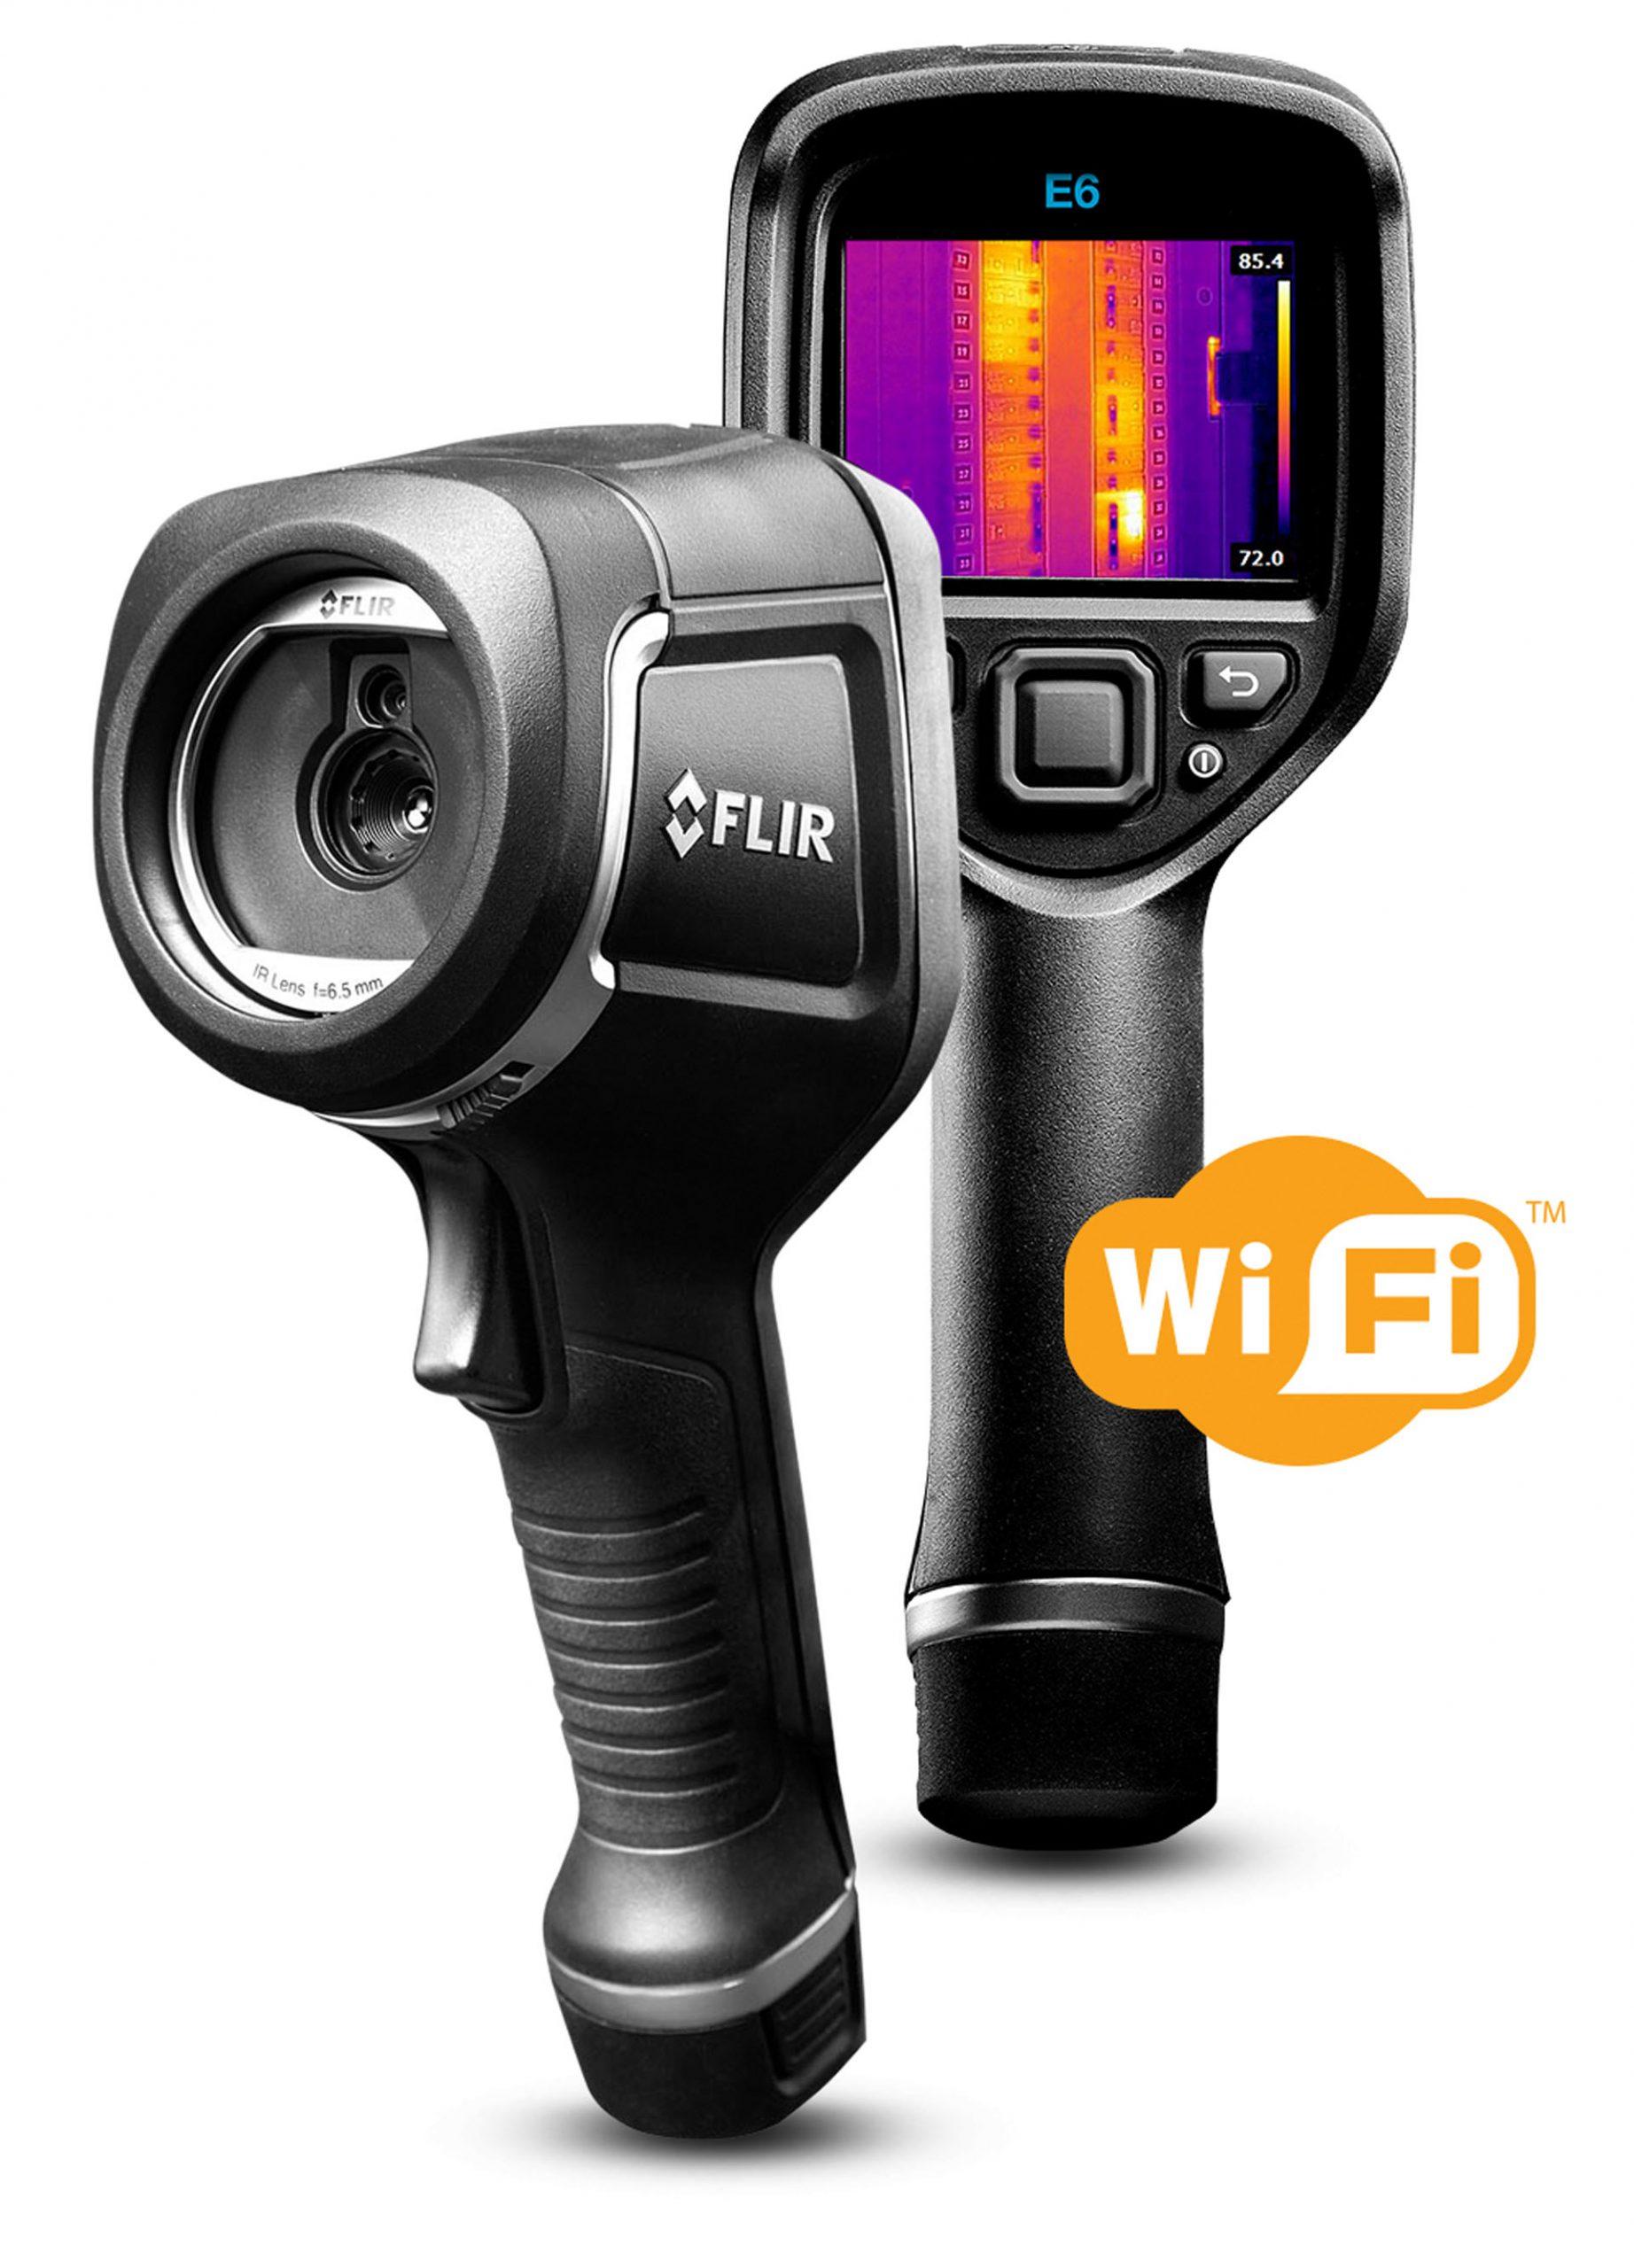 4 Best Wifi Thermal Cameras